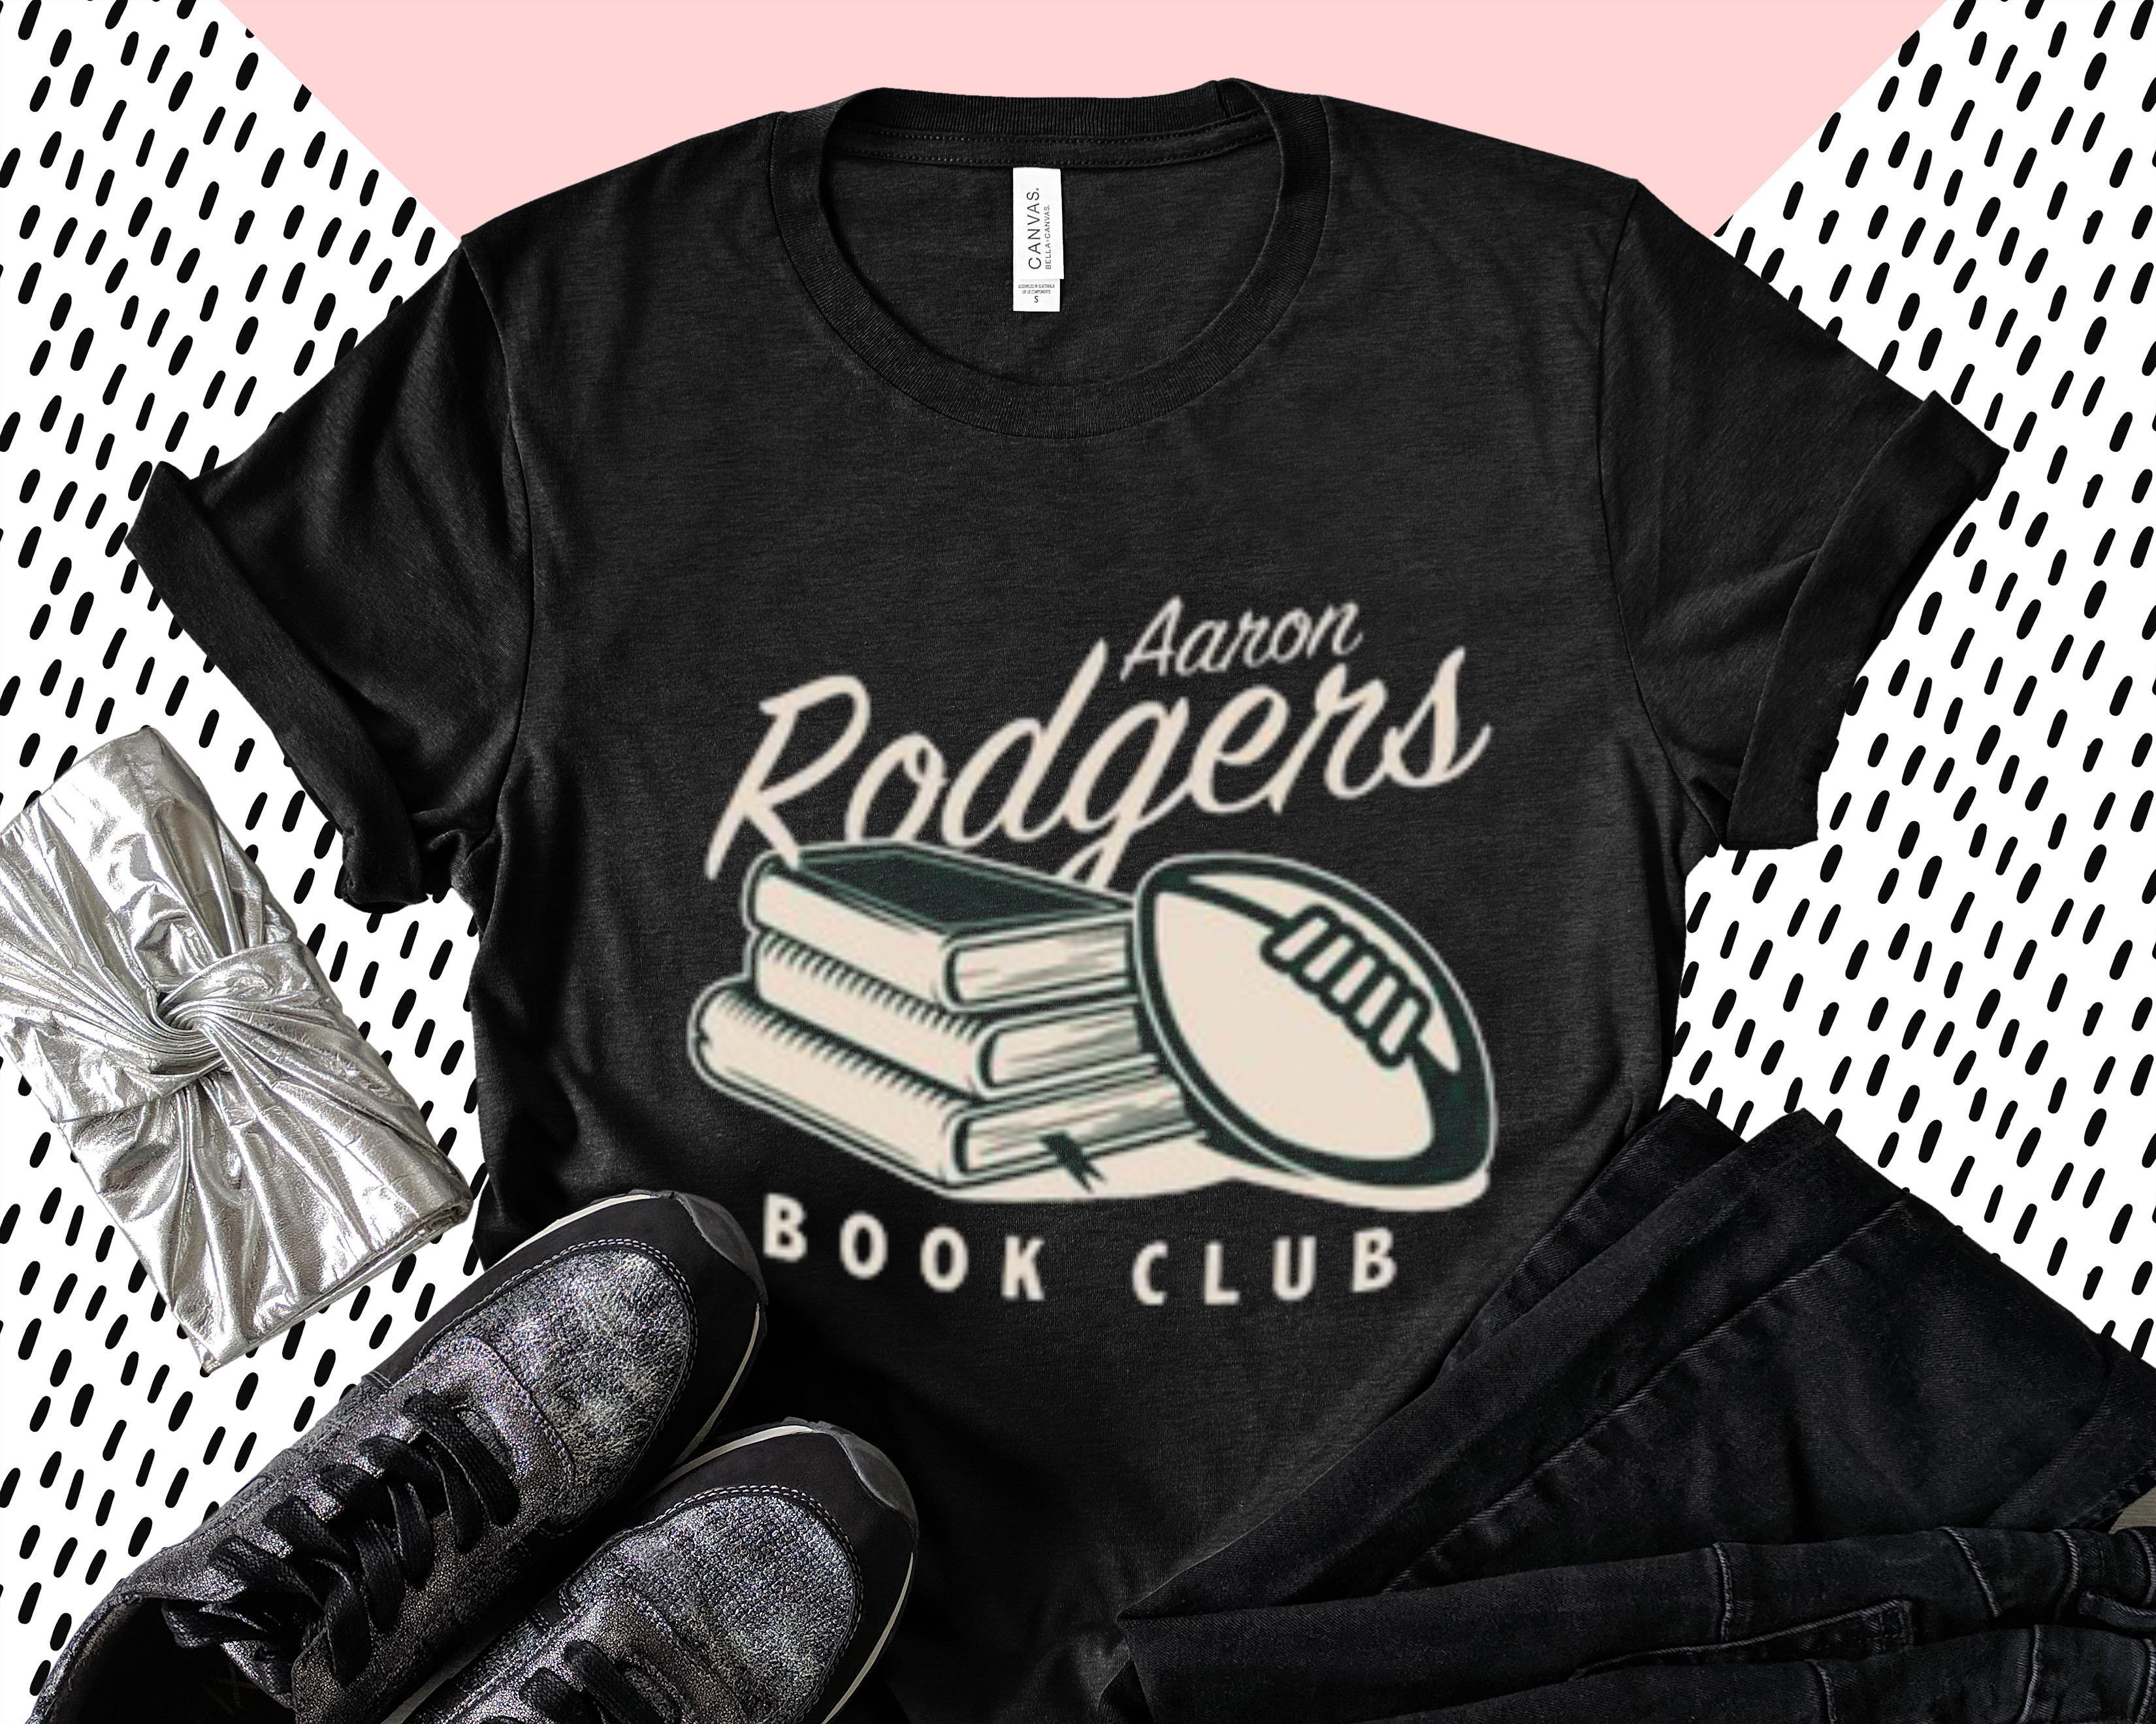 Premium Aaron Charles Rodgers Book Club shirt